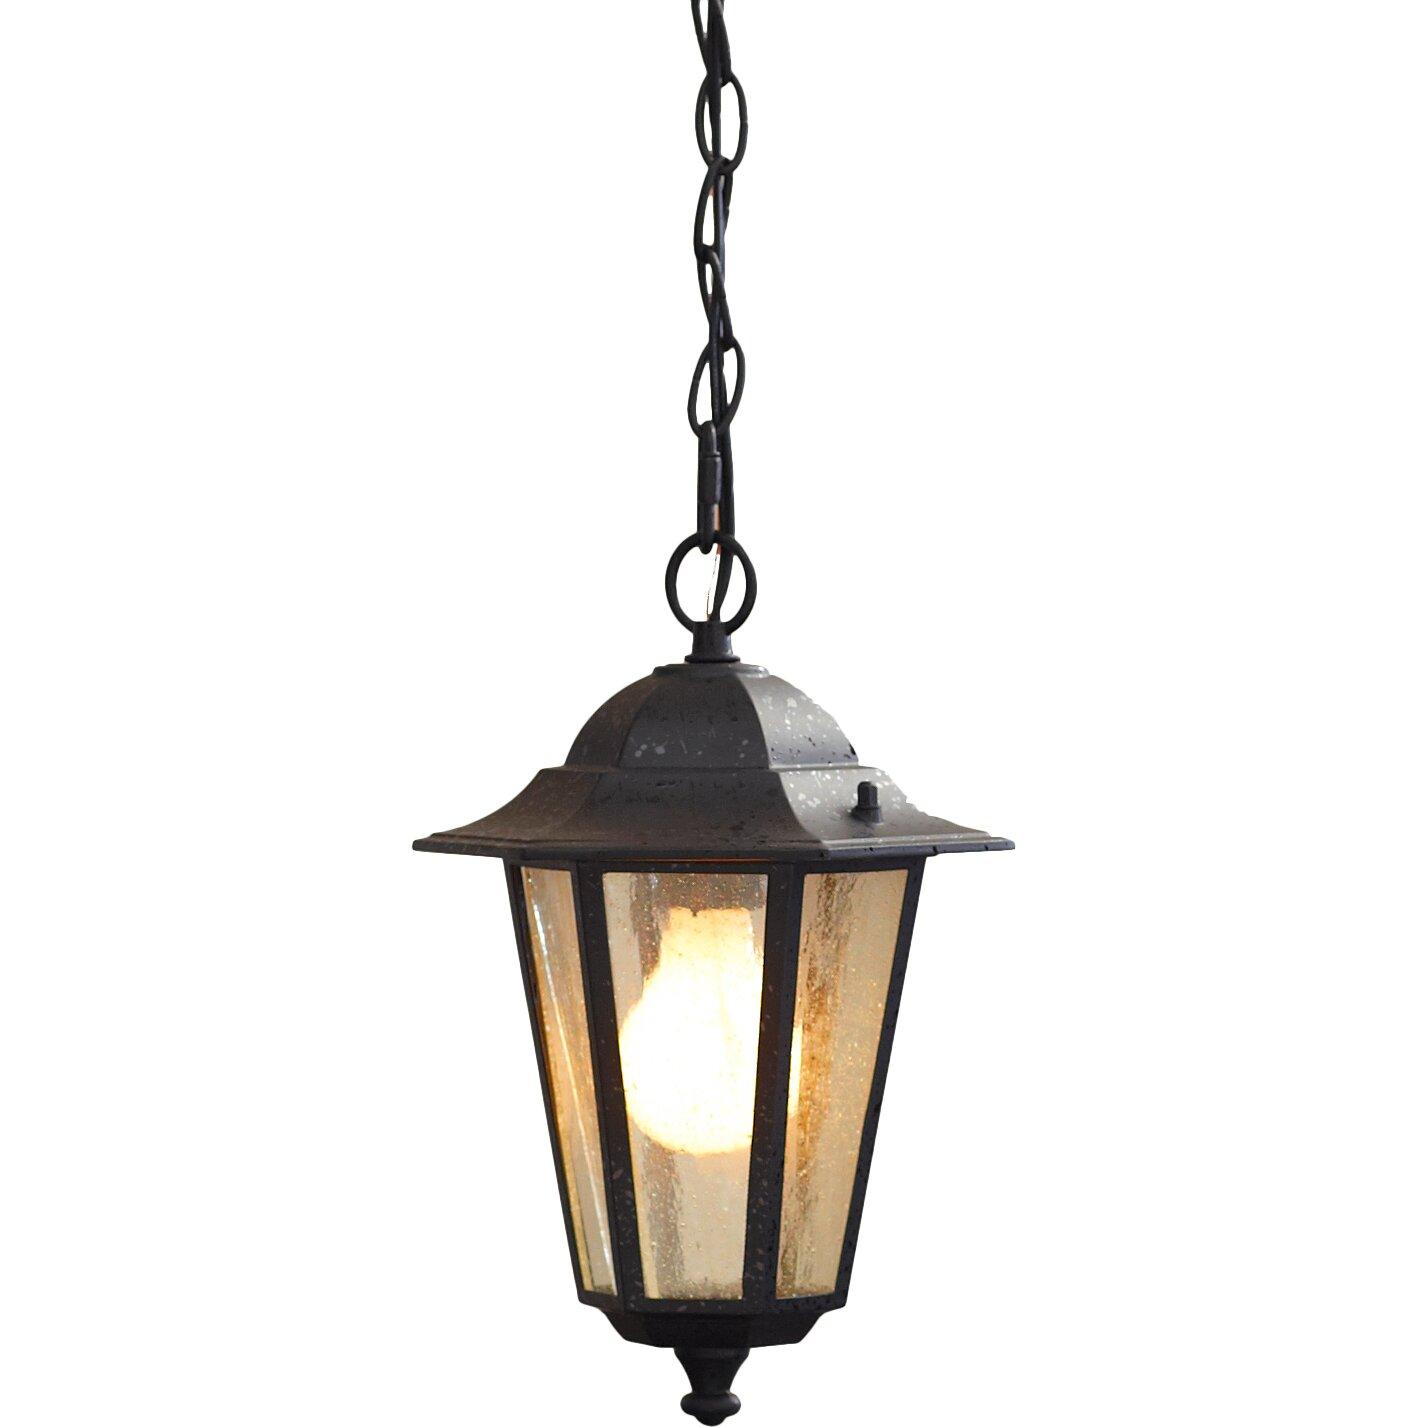 Wayfair Outdoor Hanging Lights: Alcott Hill Mayer 1 Light Outdoor Hanging Lantern